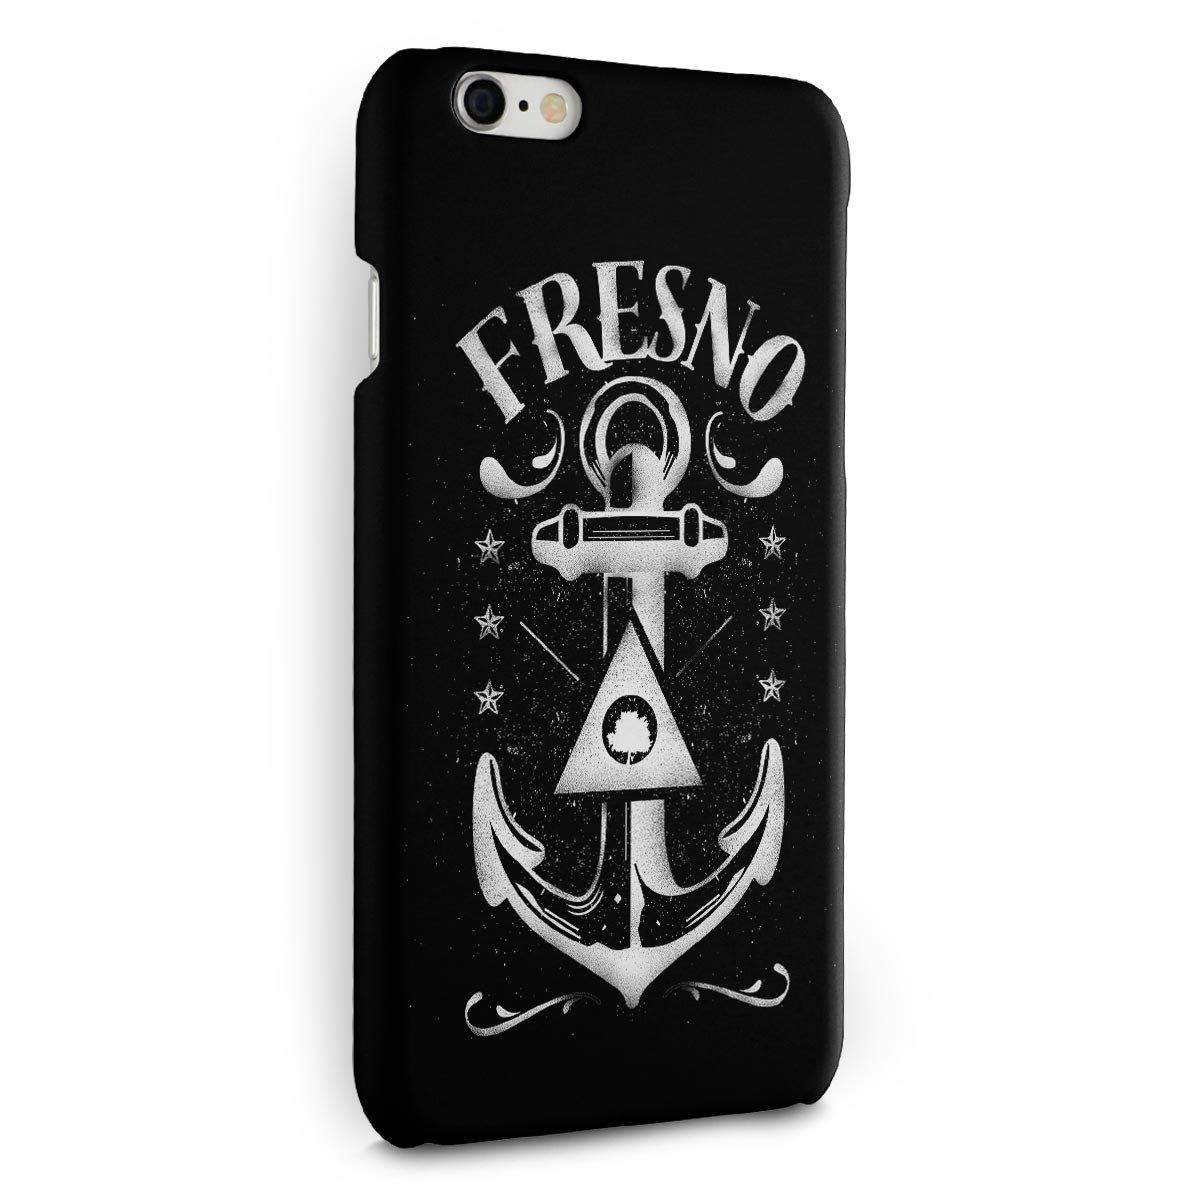 Capa para iPhone 6/6S Plus Fresno Anchor